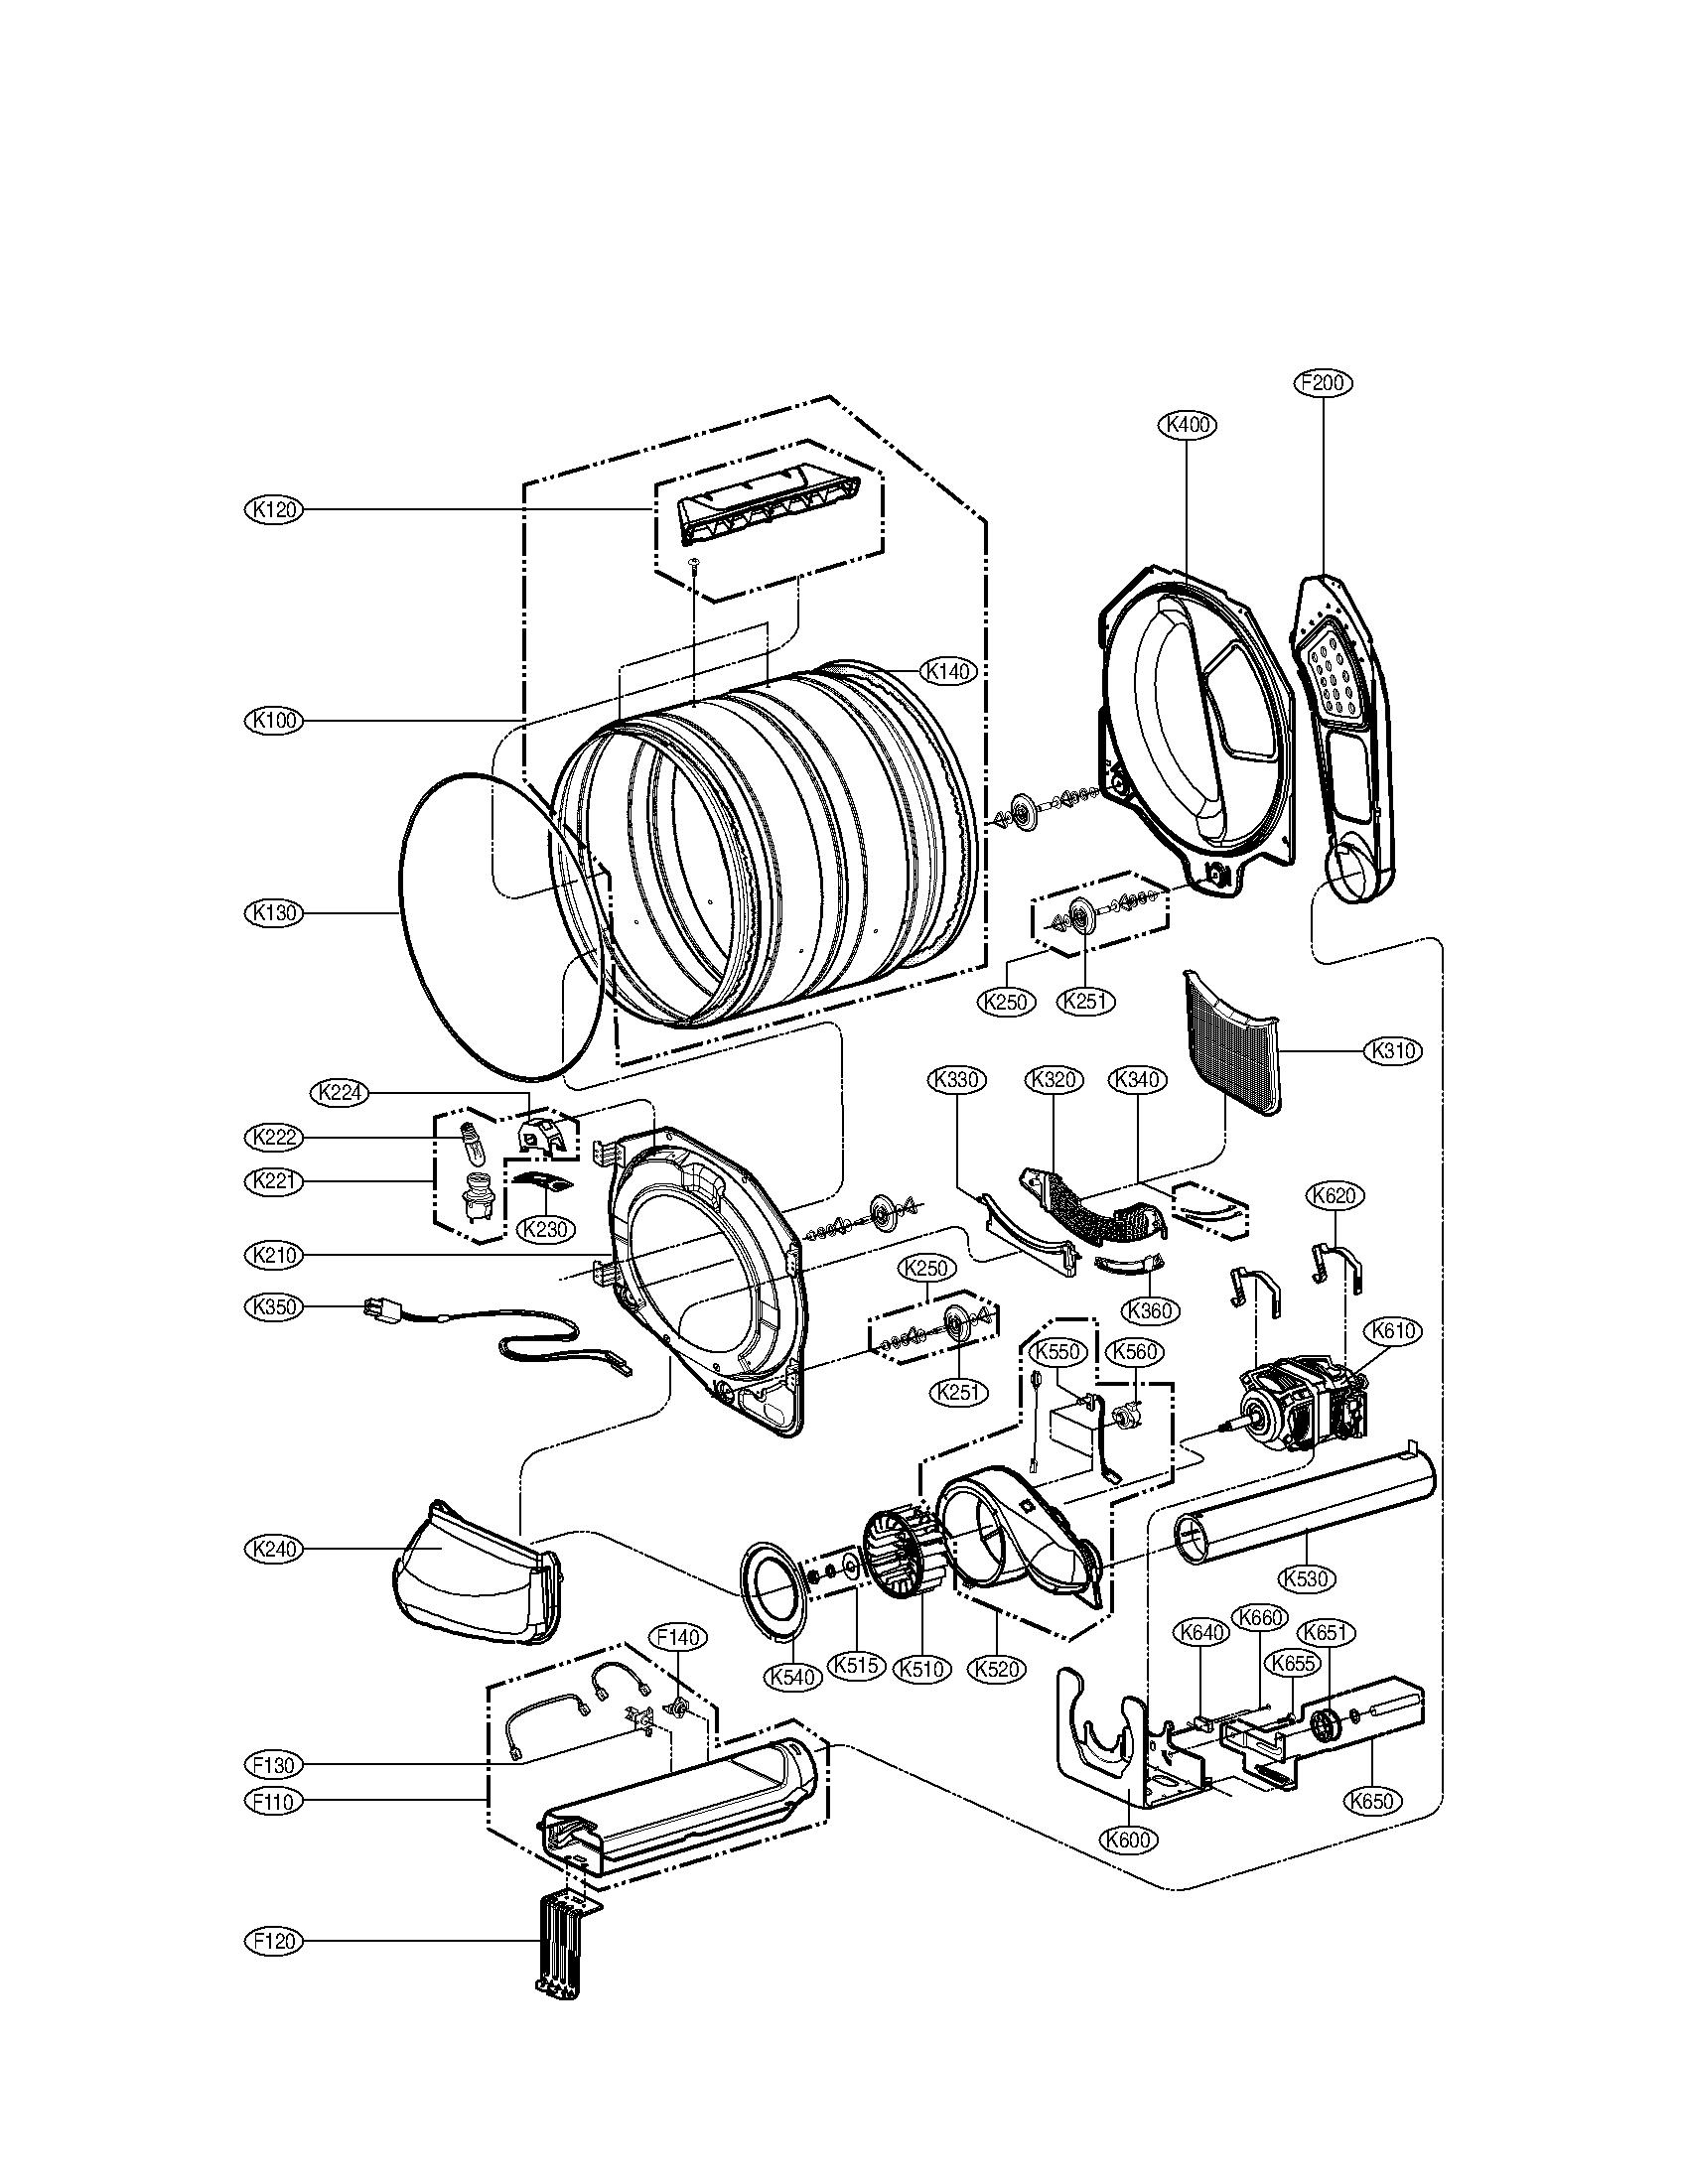 XH_6719] K31 Parts Diagram Free DiagramWww Mohammedshrine Librar Wiring 101